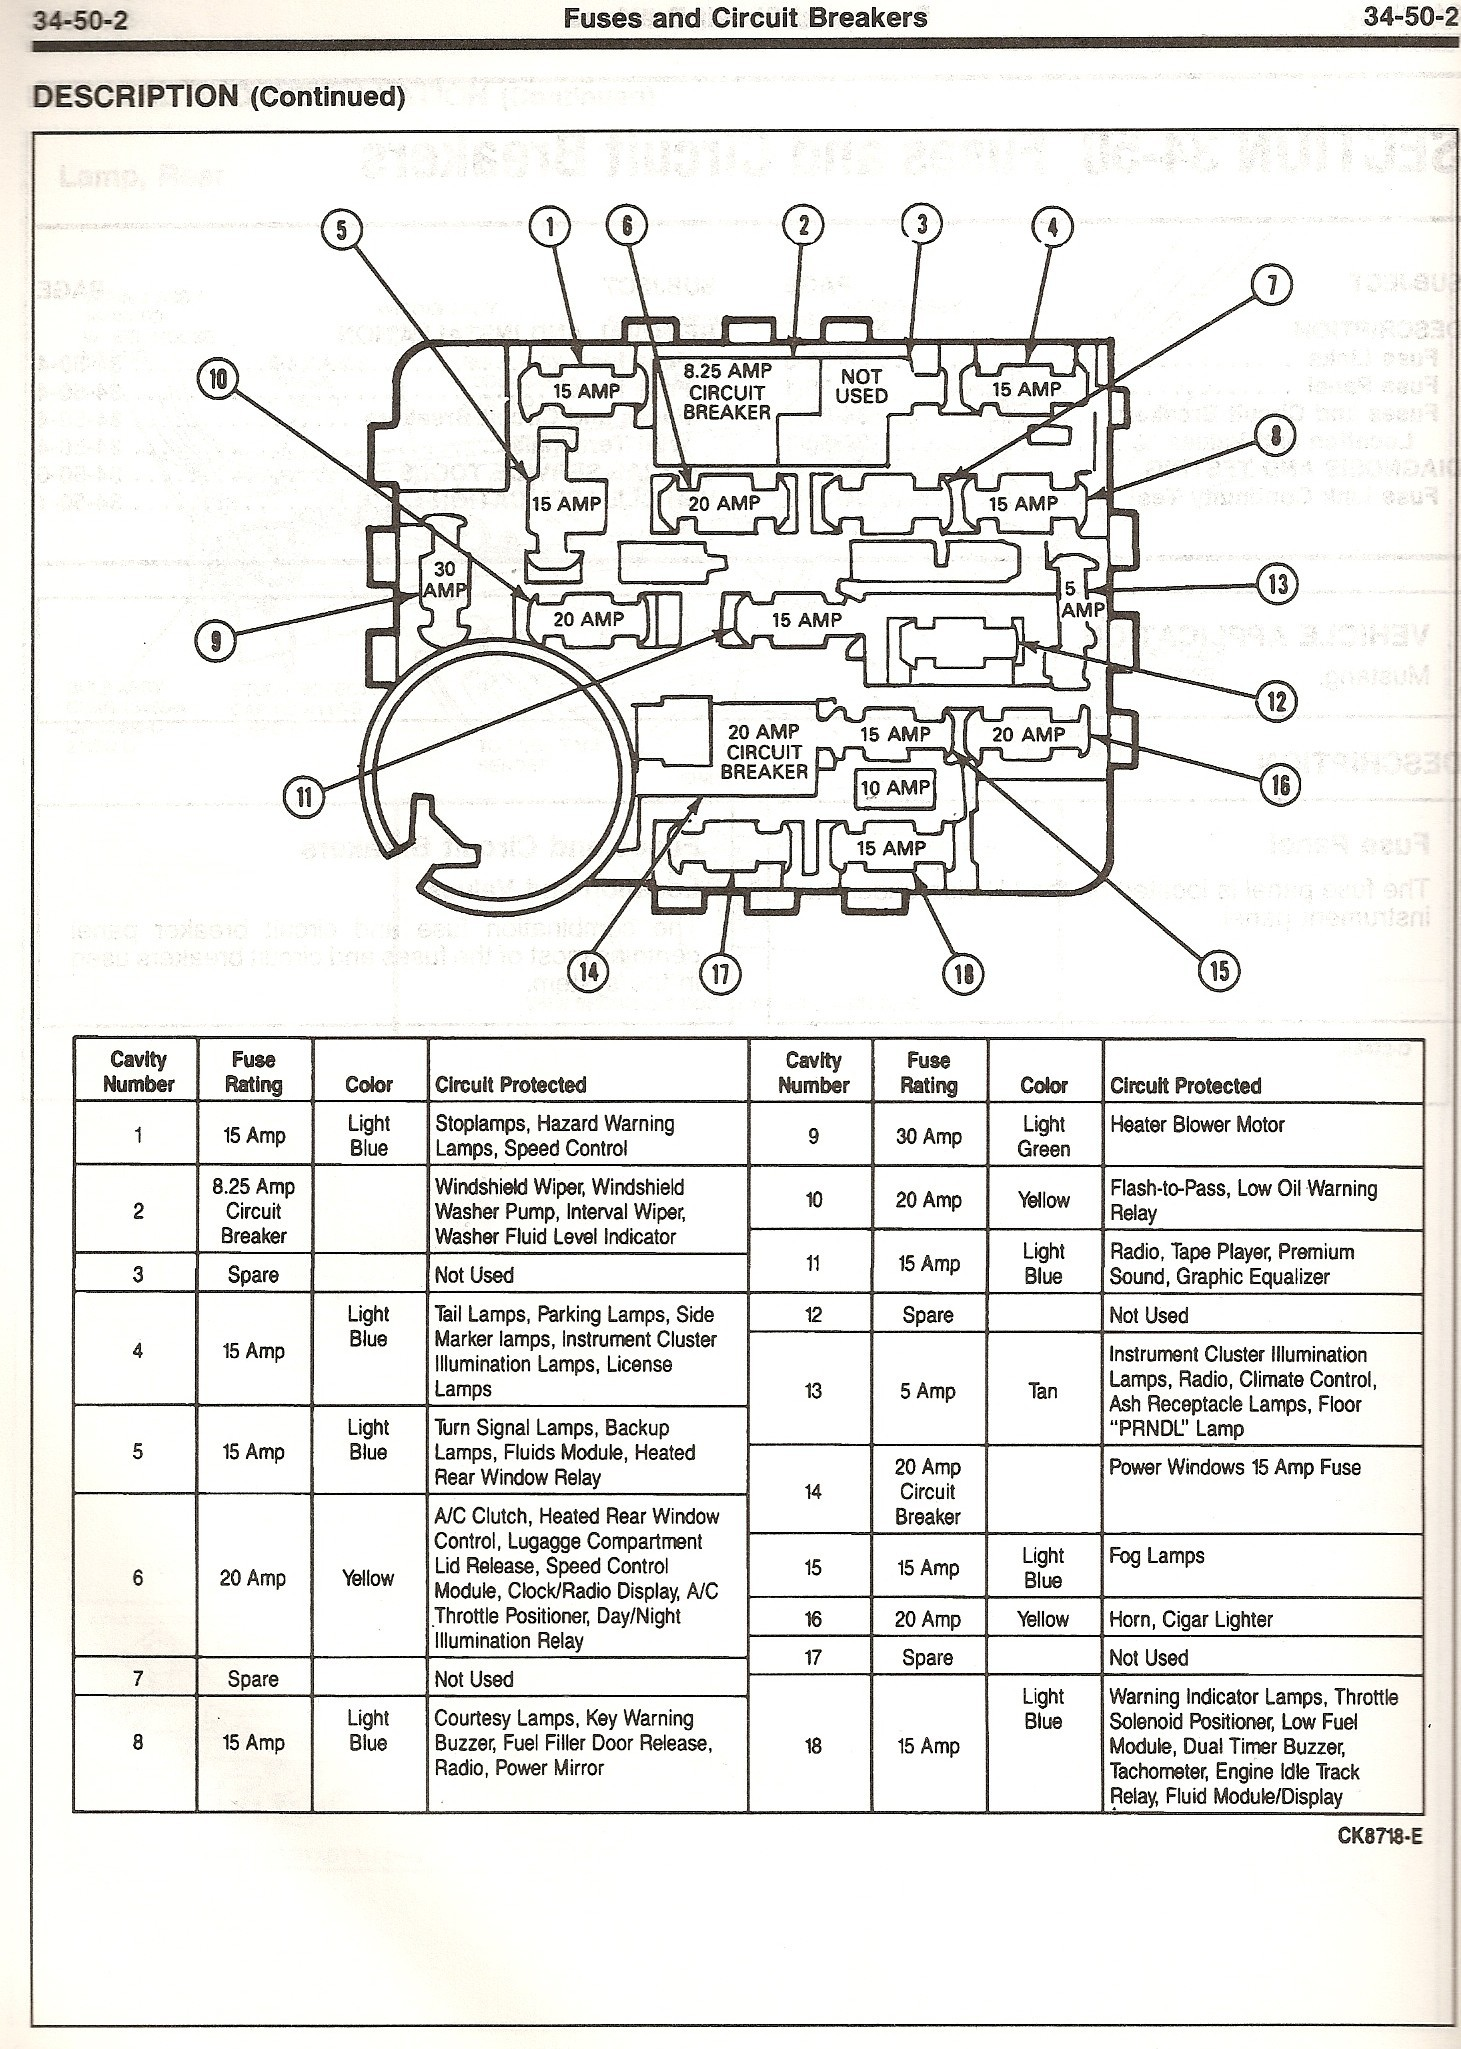 Ford Explorer Engine Diagram Diagram ford Explorer Fuse Panel Diagram Of Ford Explorer Engine Diagram